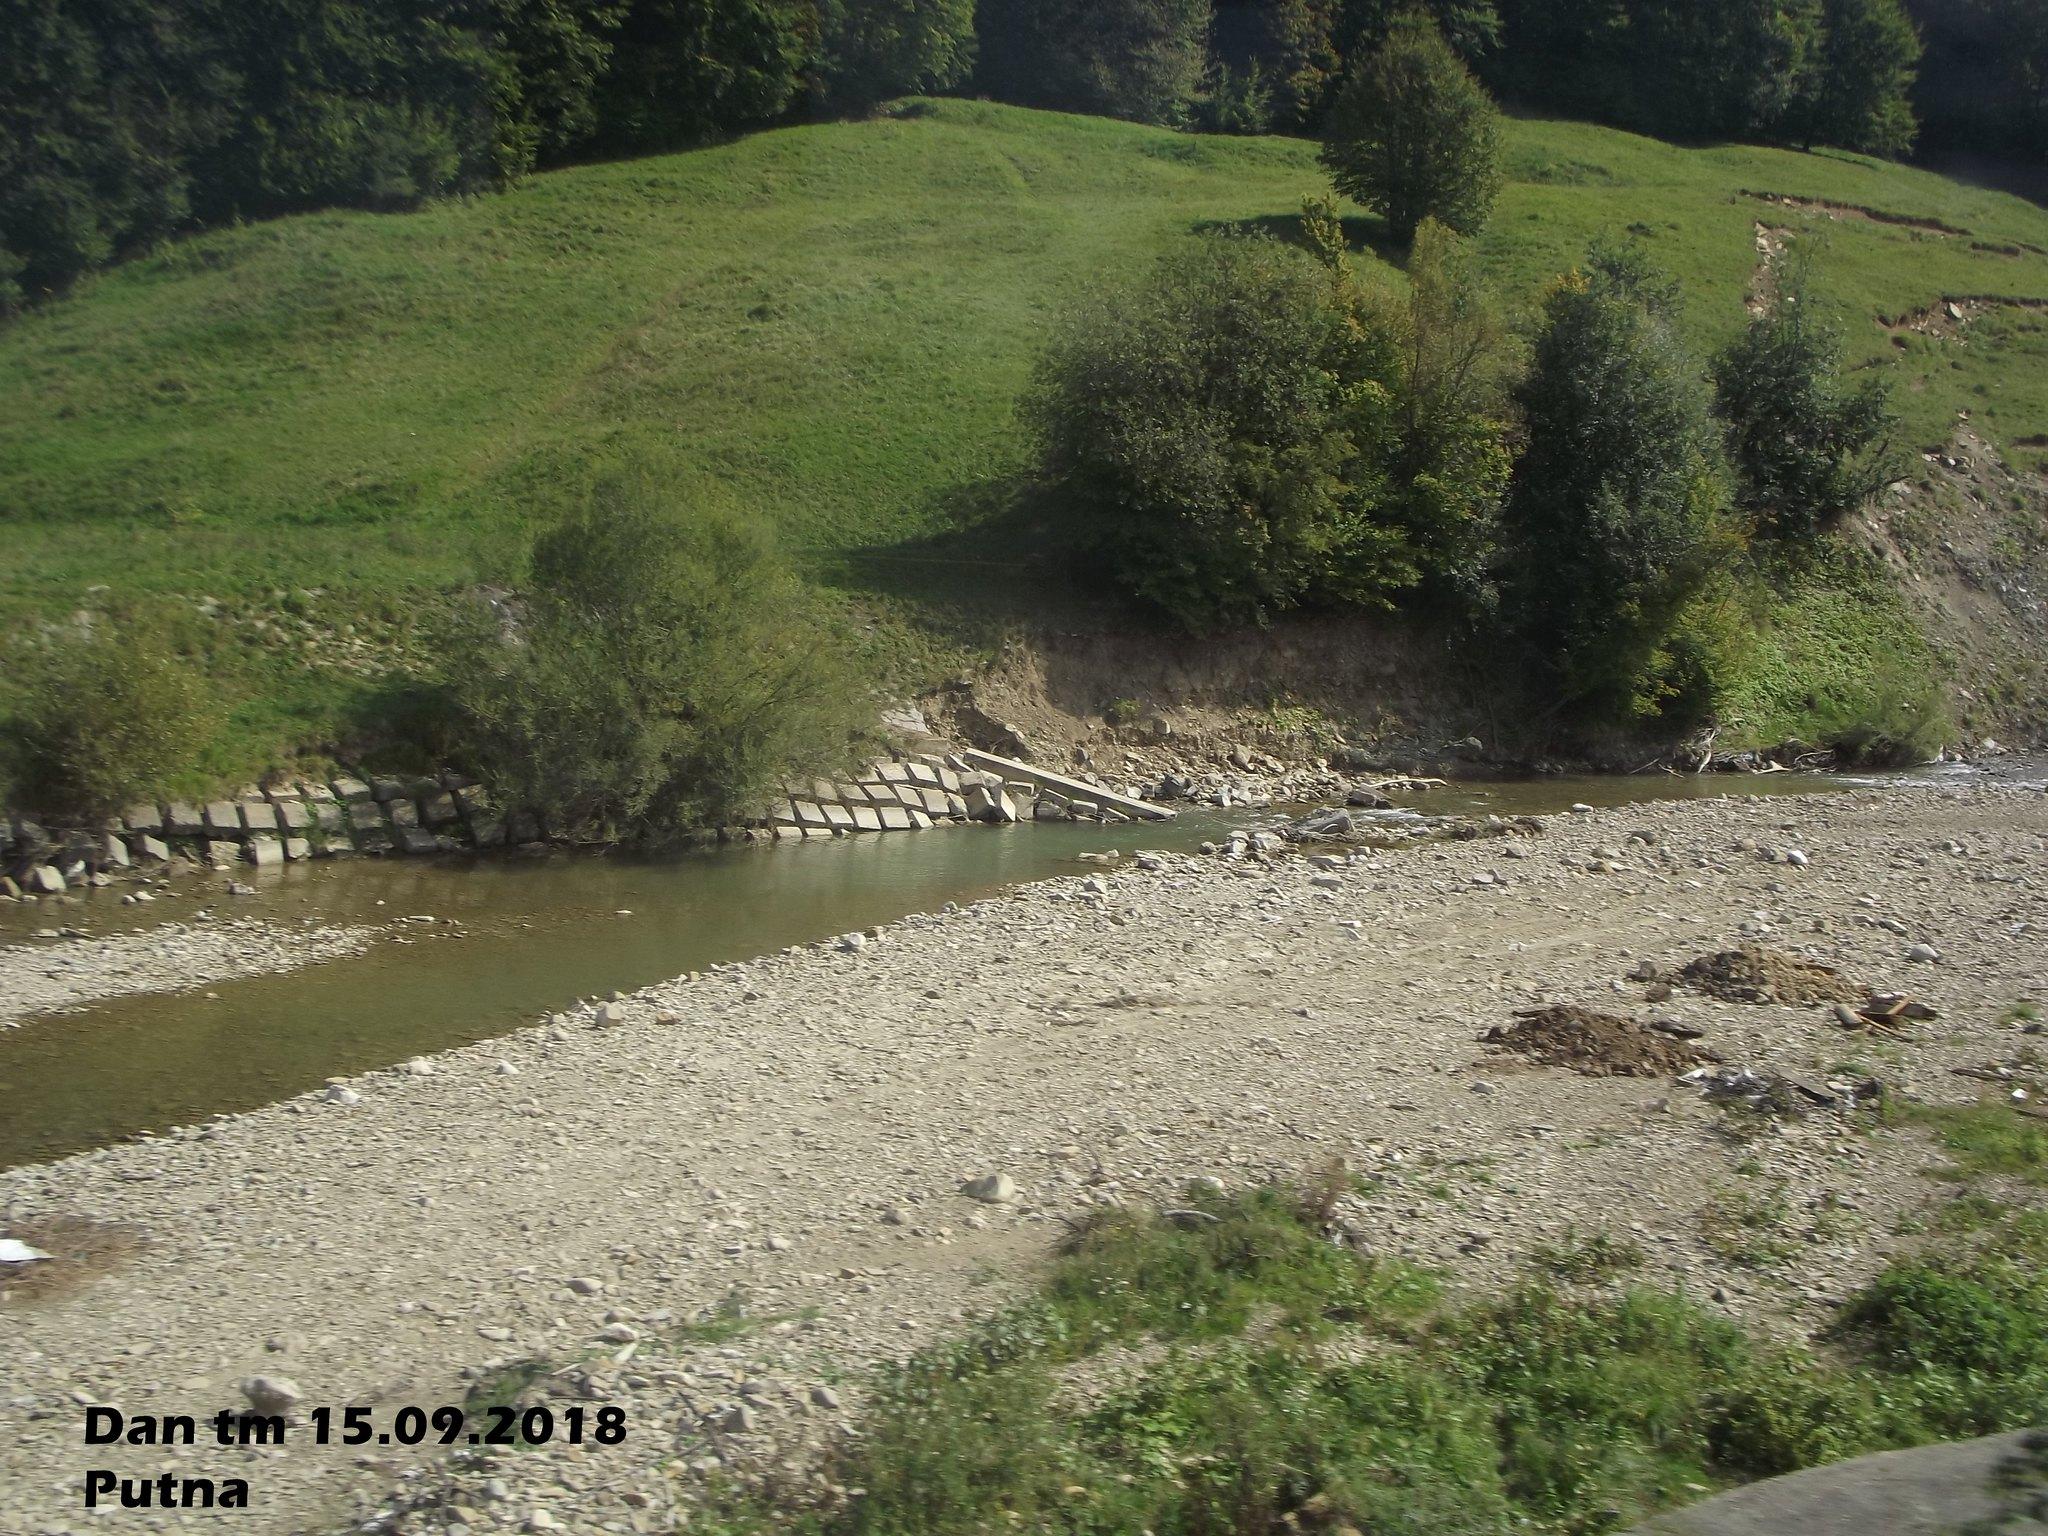 515 : Dorneşti - Gura Putnei - (Putna) - Nisipitu - Seletin UKR - Pagina 47 43826157345_93a318f51d_k